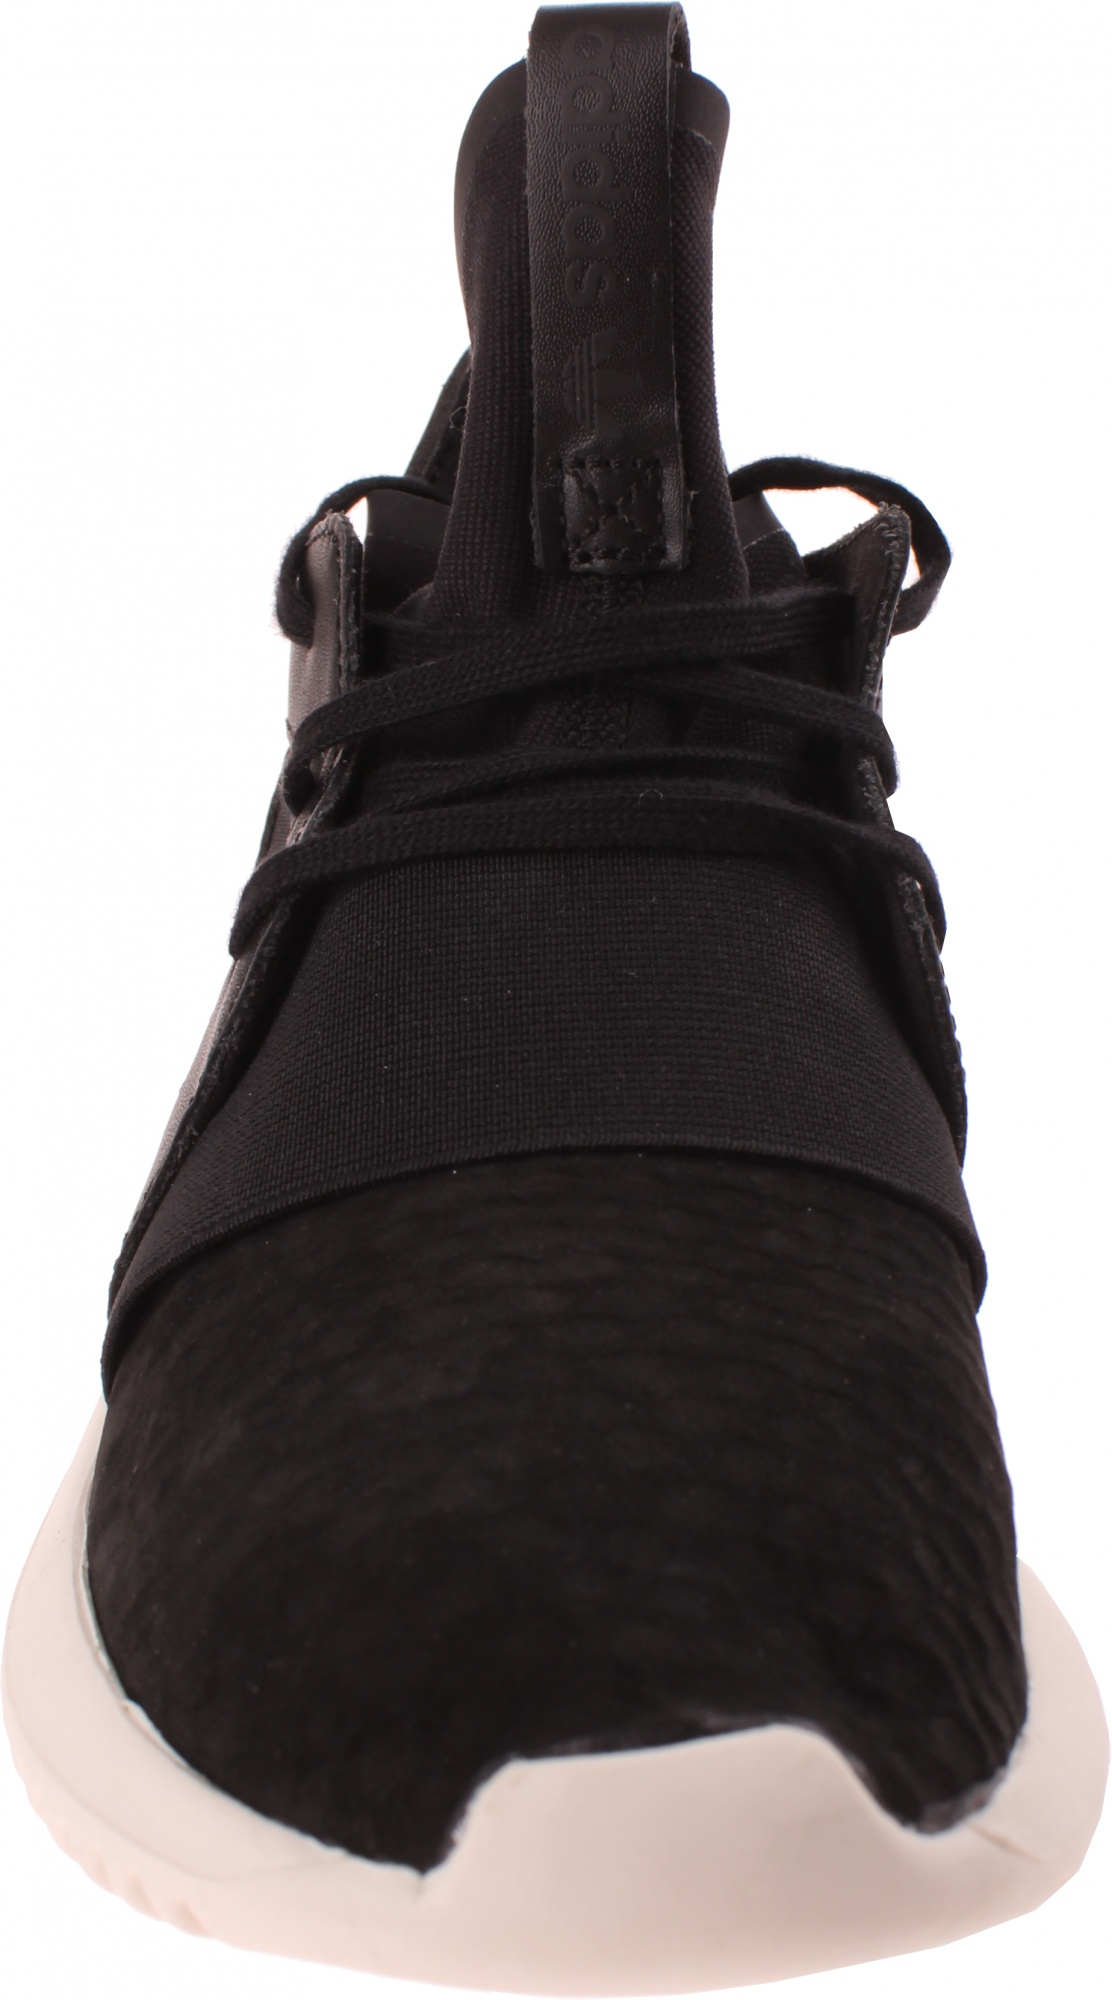 adidas Sneakers Tubular Defiant Frauen schwarz Internet